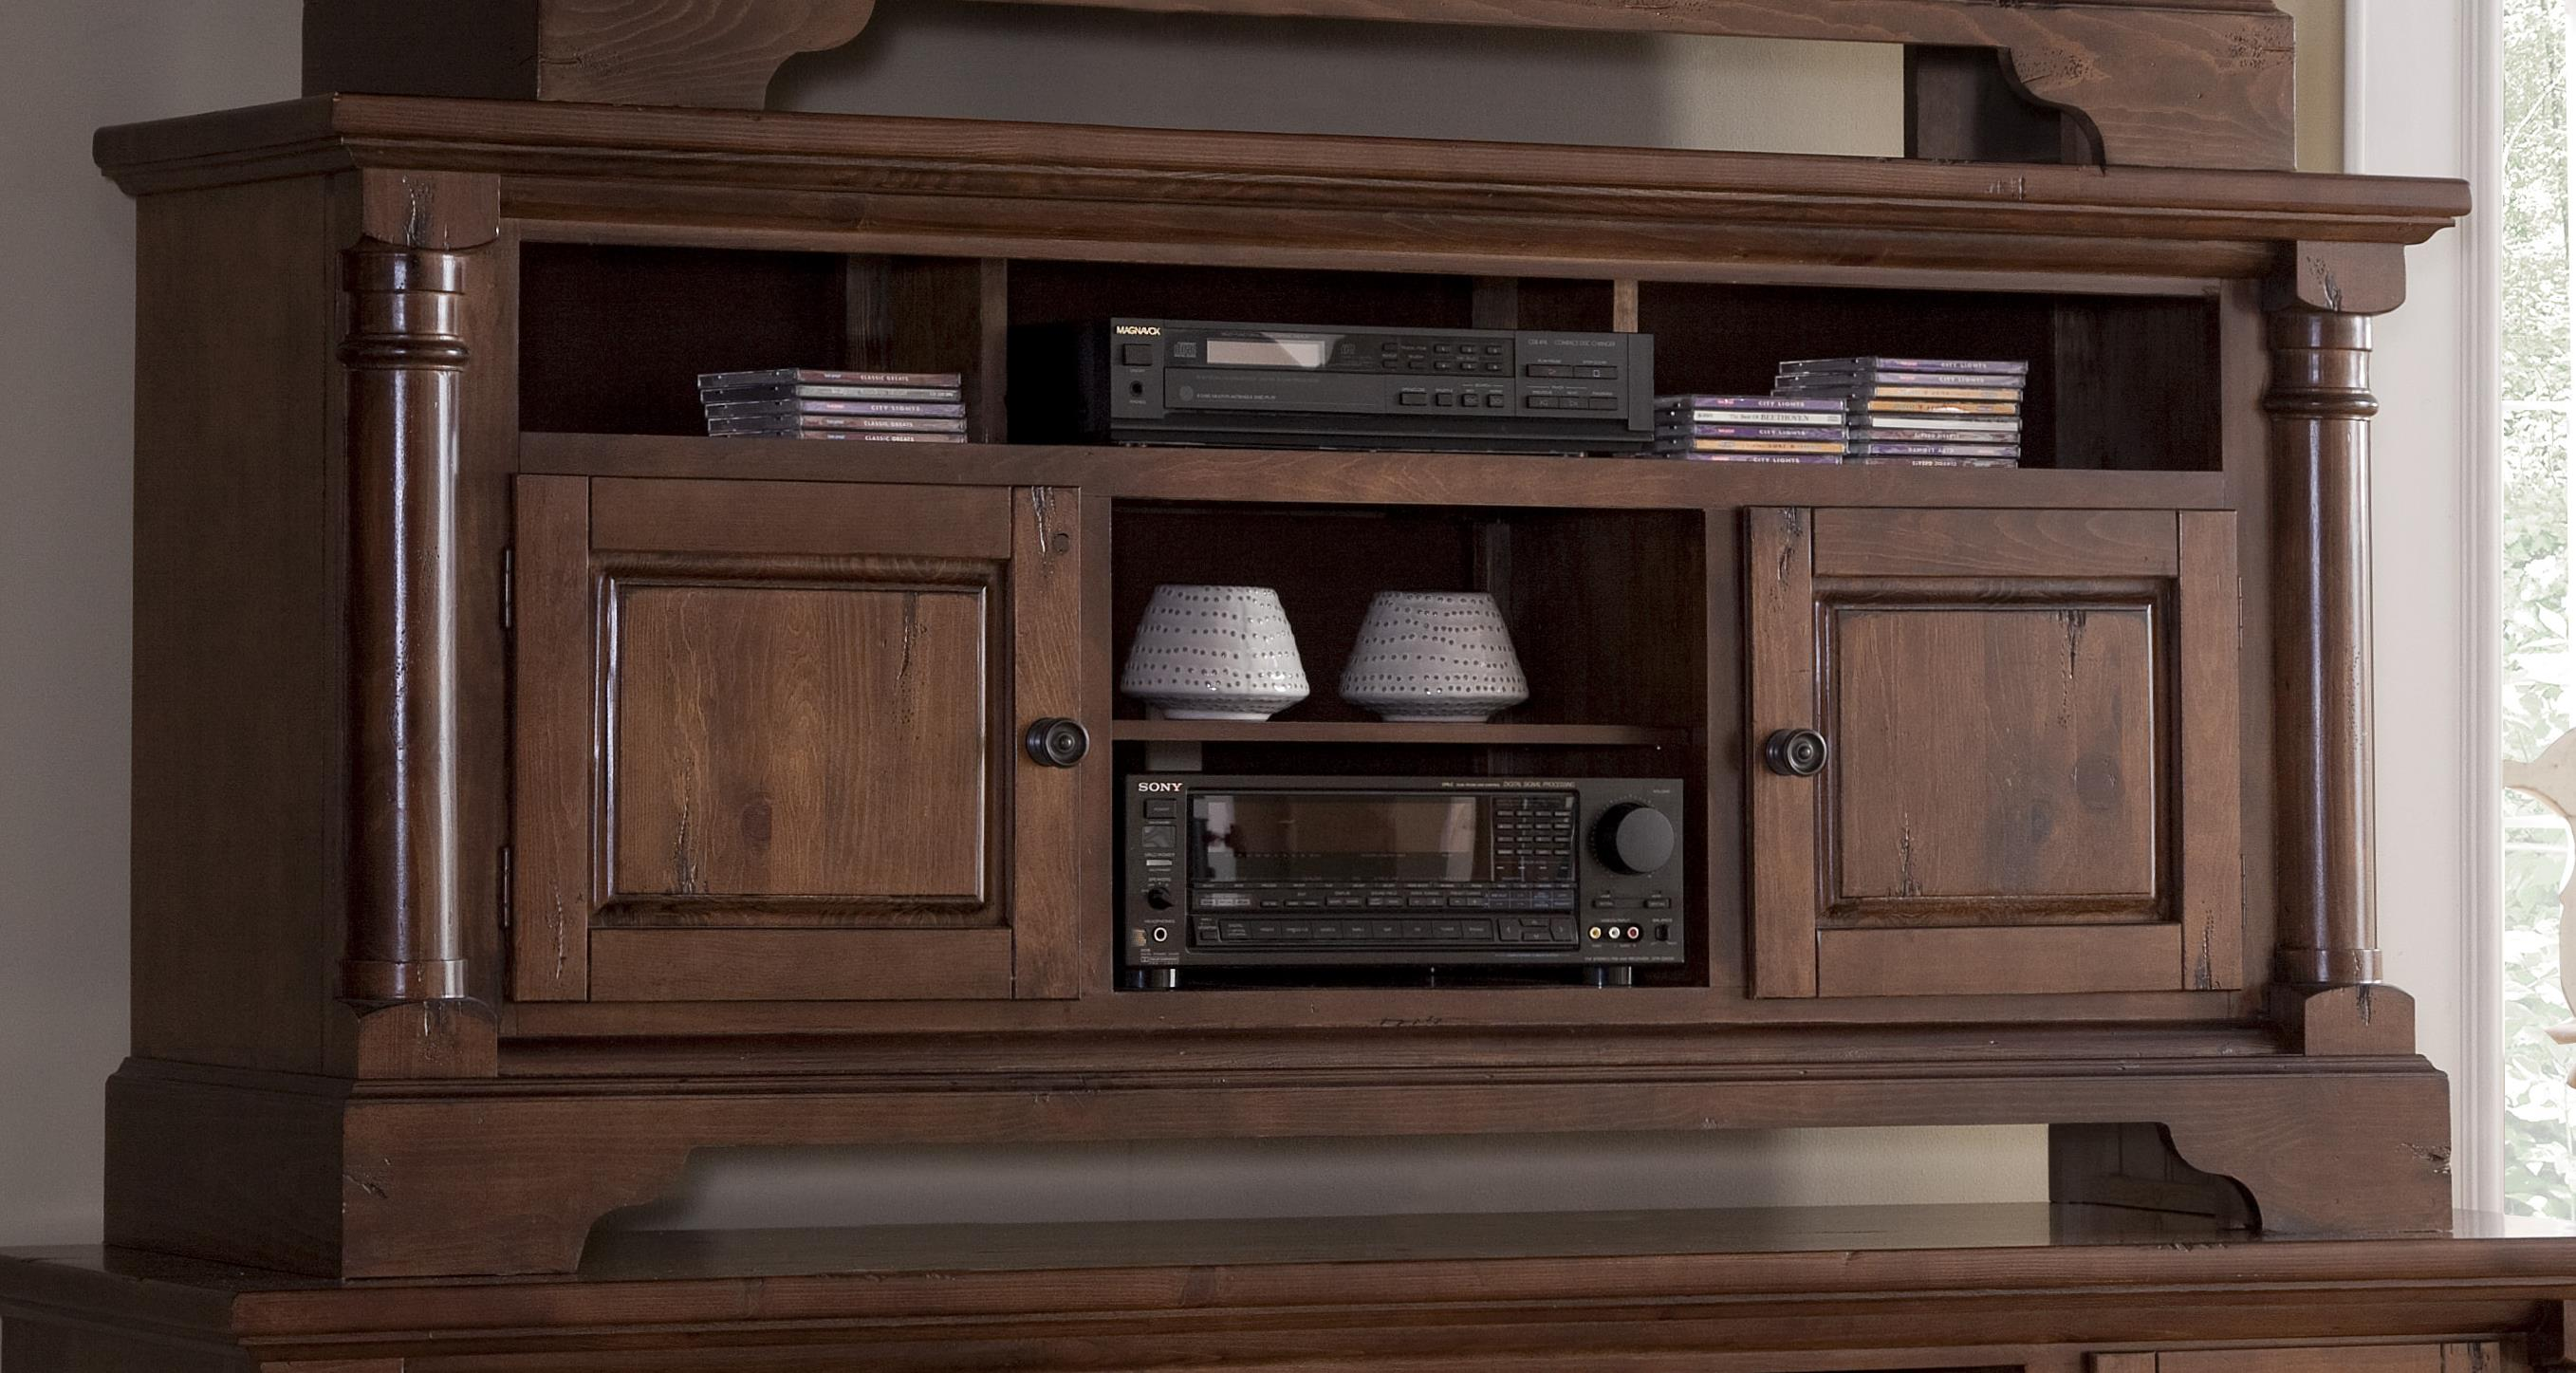 Progressive Furniture Gramercy Park 64 Inch Console - Item Number: P660E-64